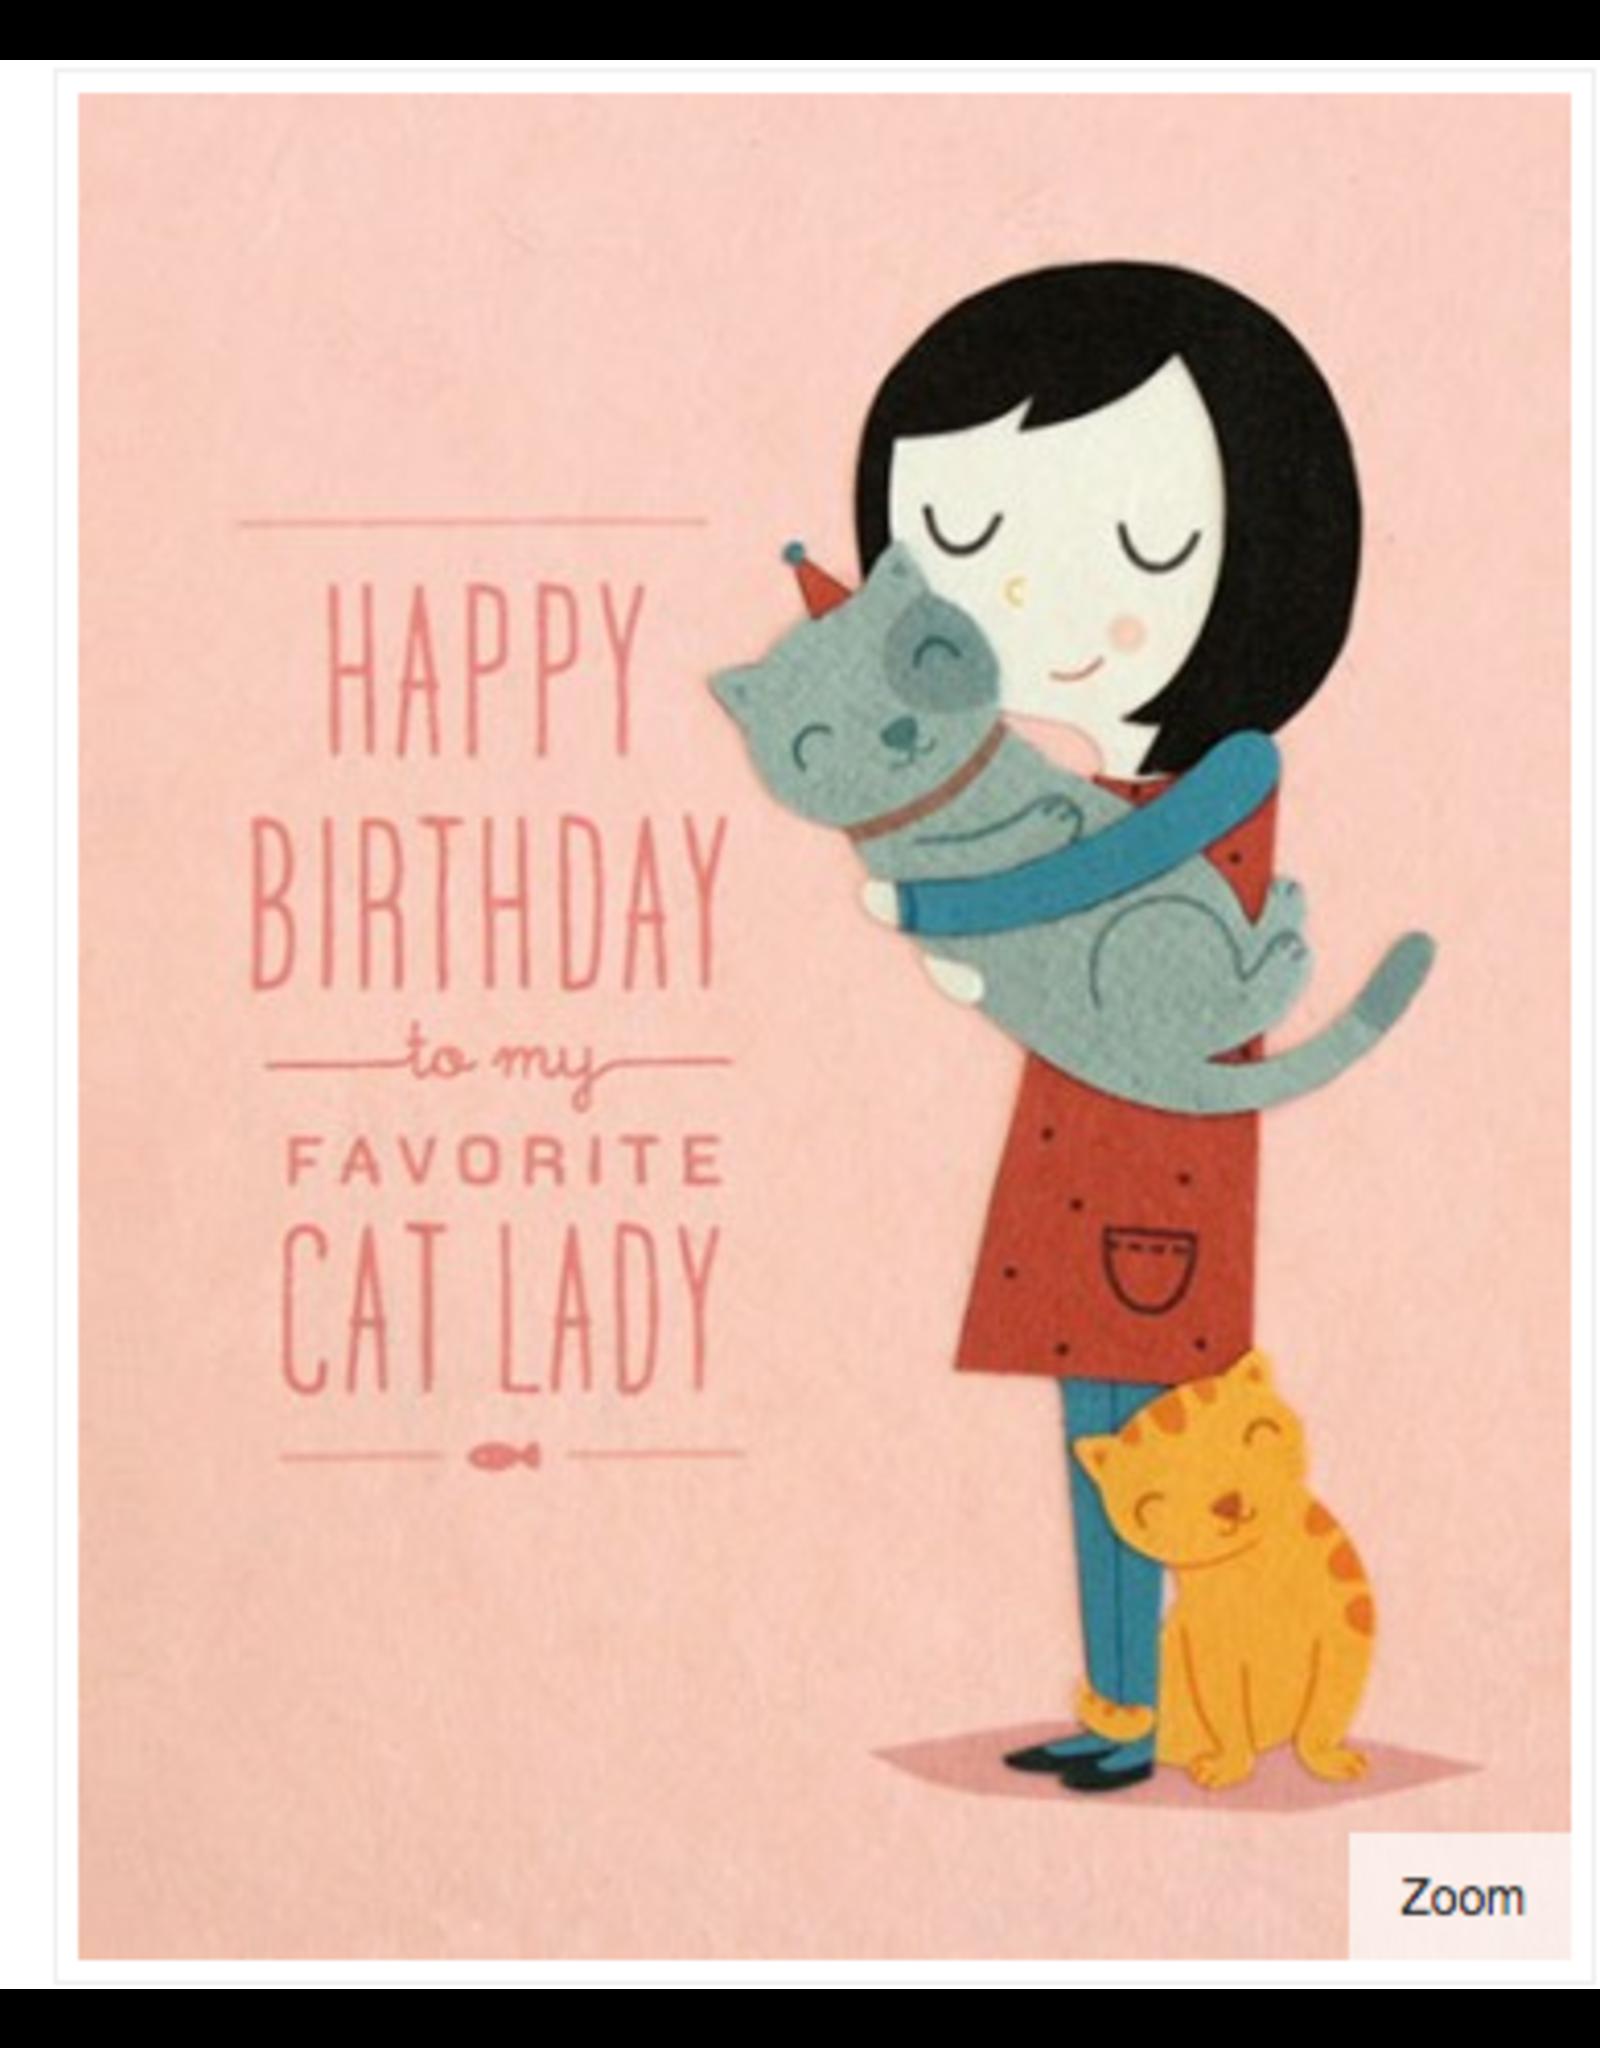 Cat Lady Birthday